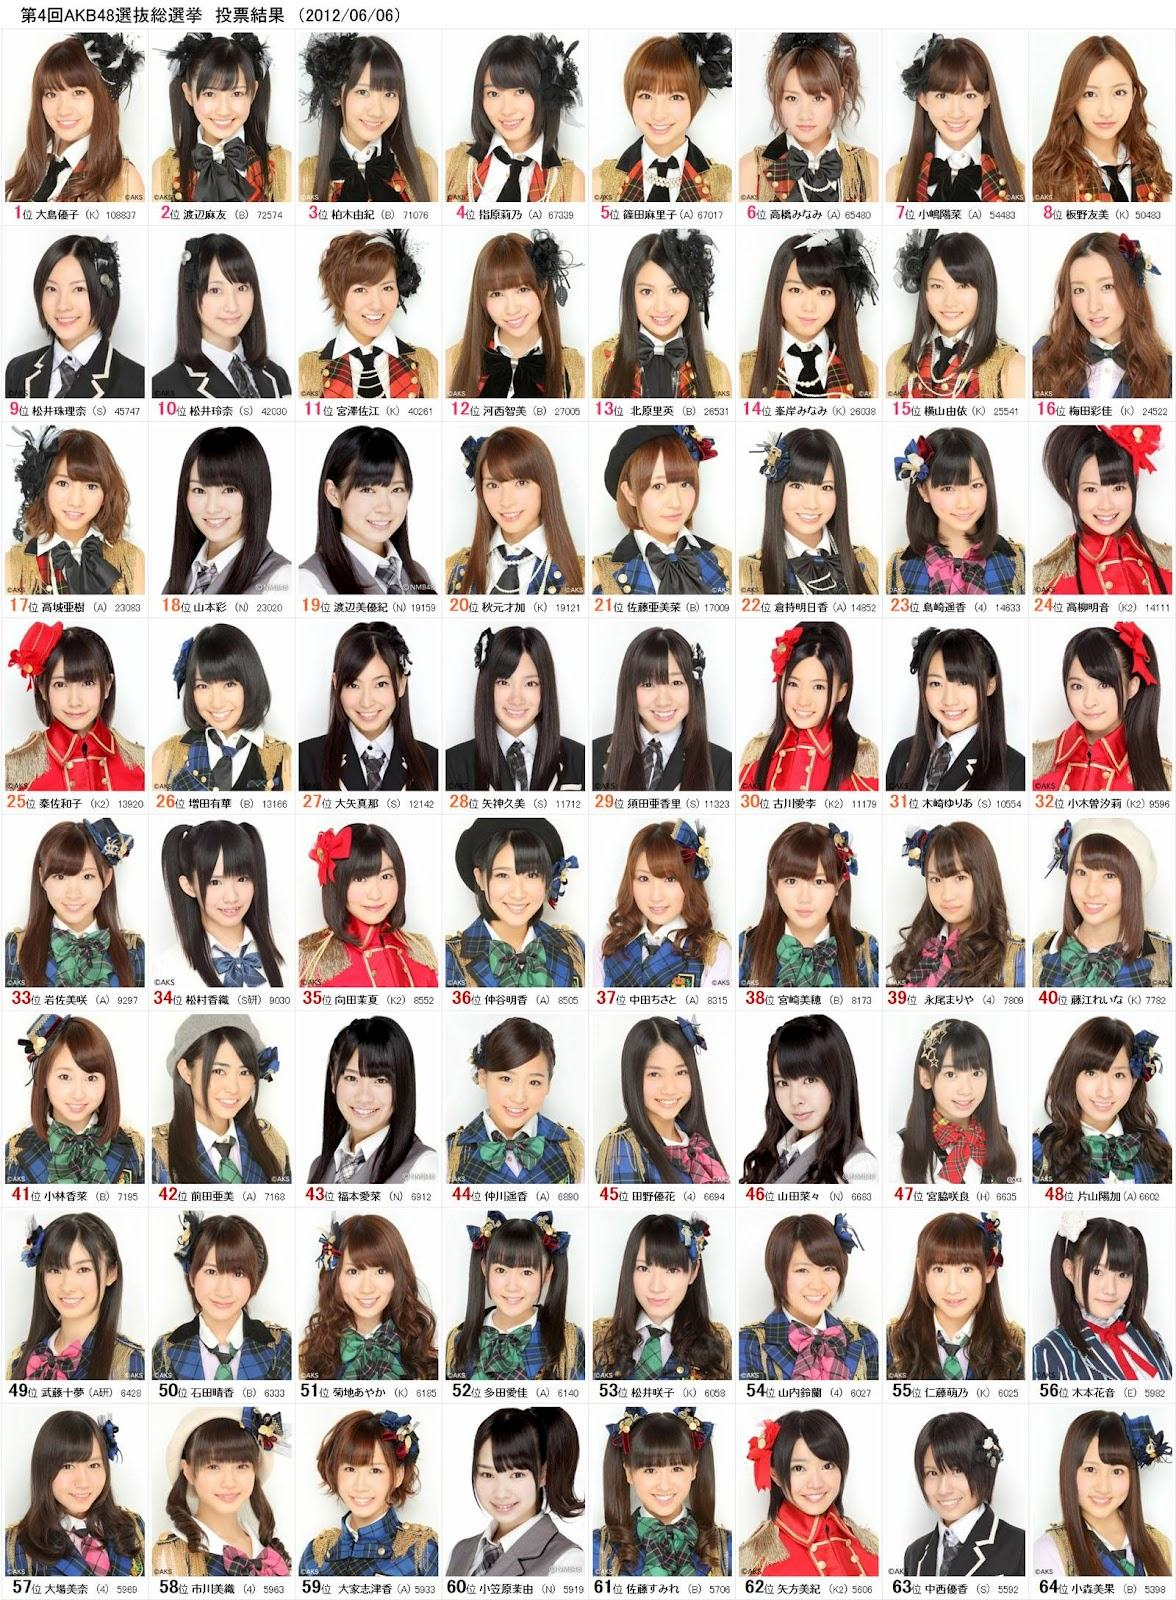 AKB48-3-unohana-the-fanpop-user-35259644-1176-1600